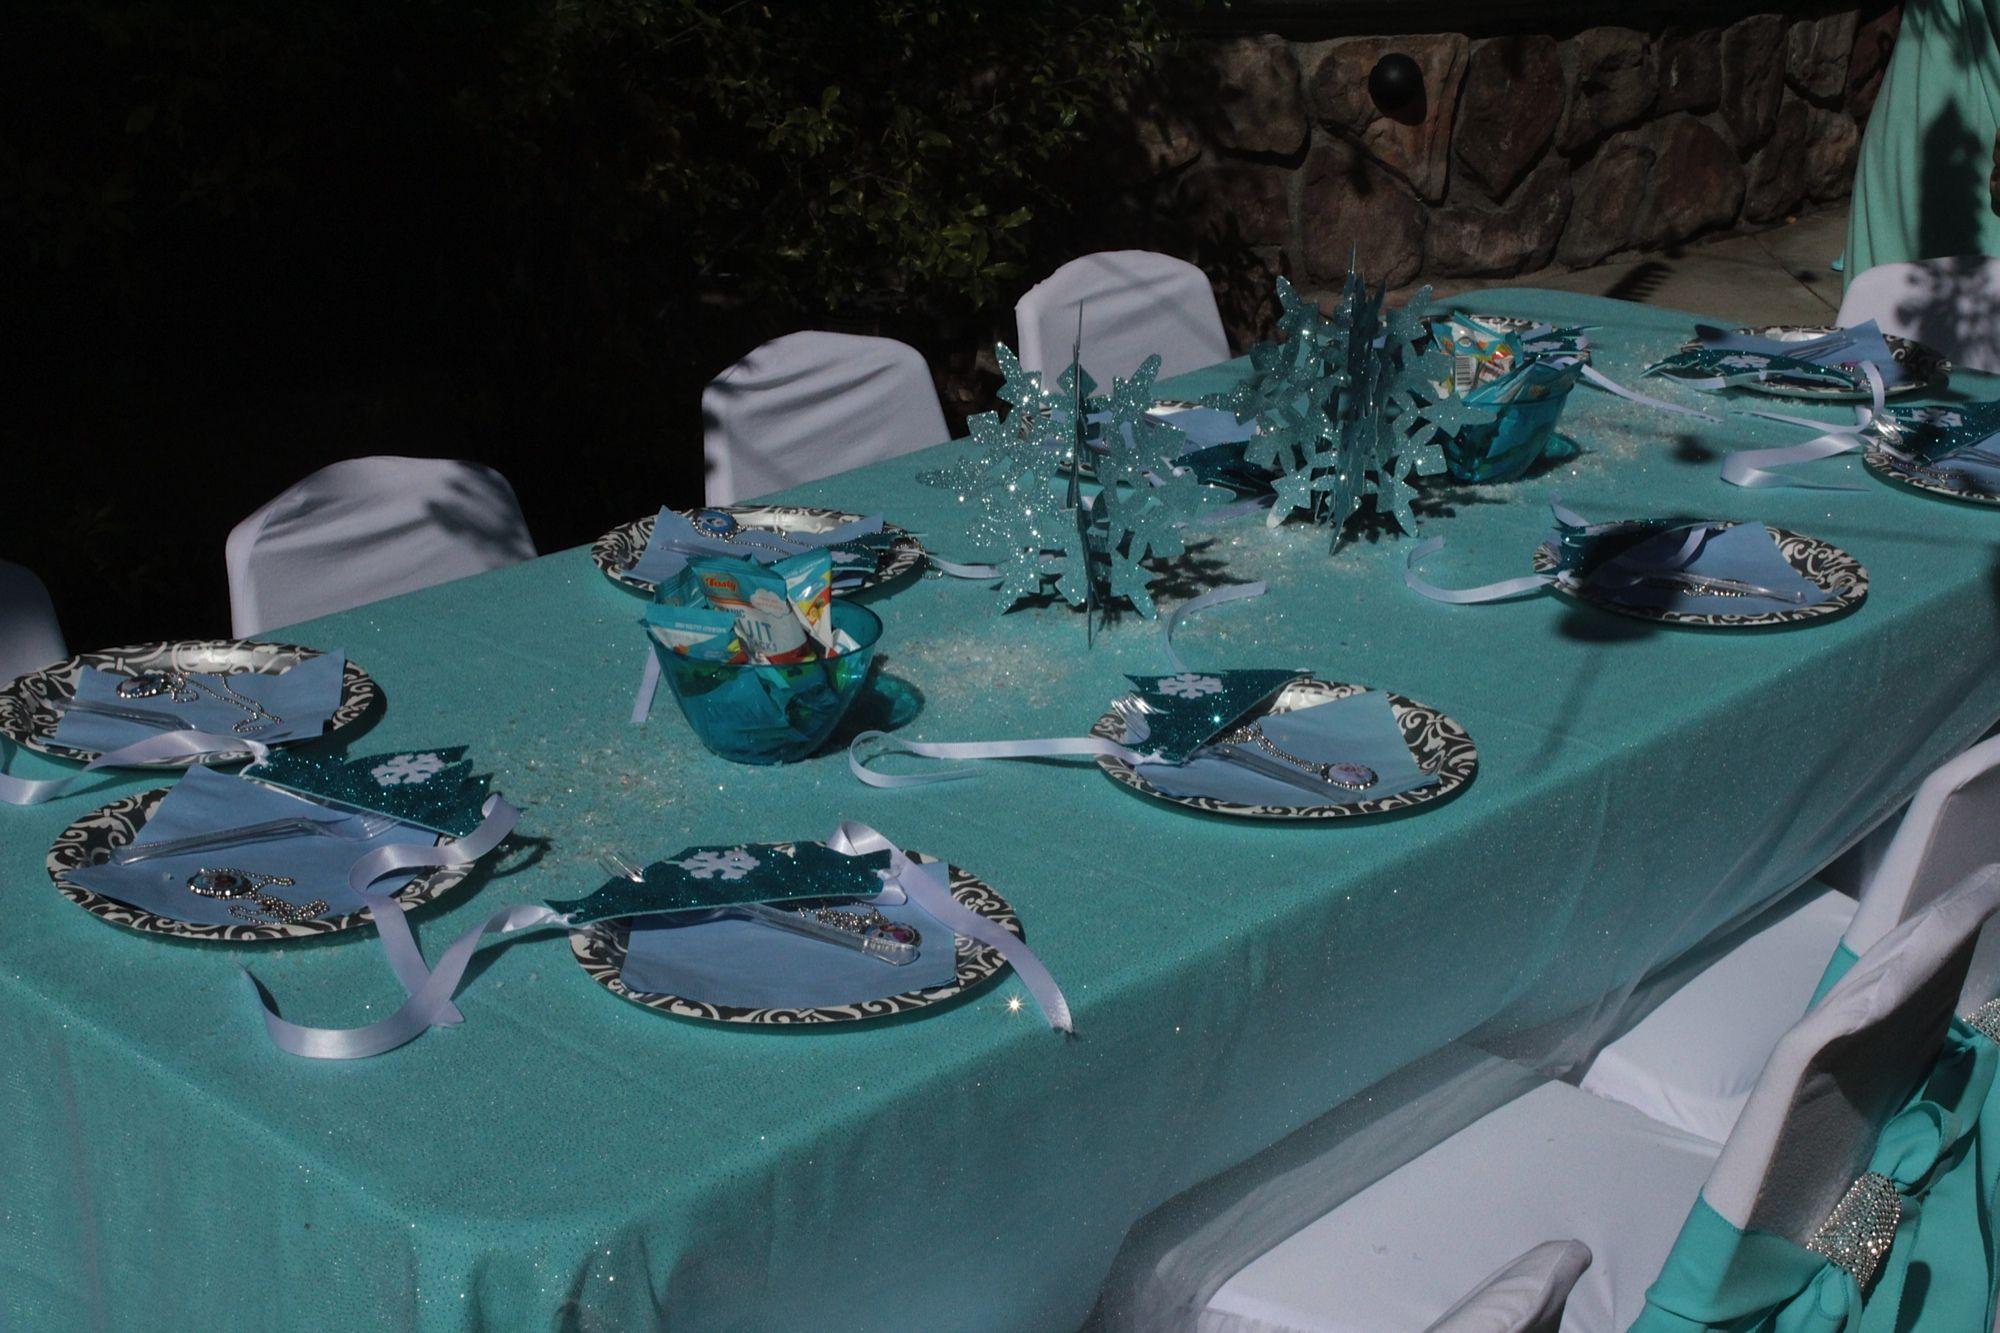 Disney Frozen party, Winter Wonderland party, decorations ...